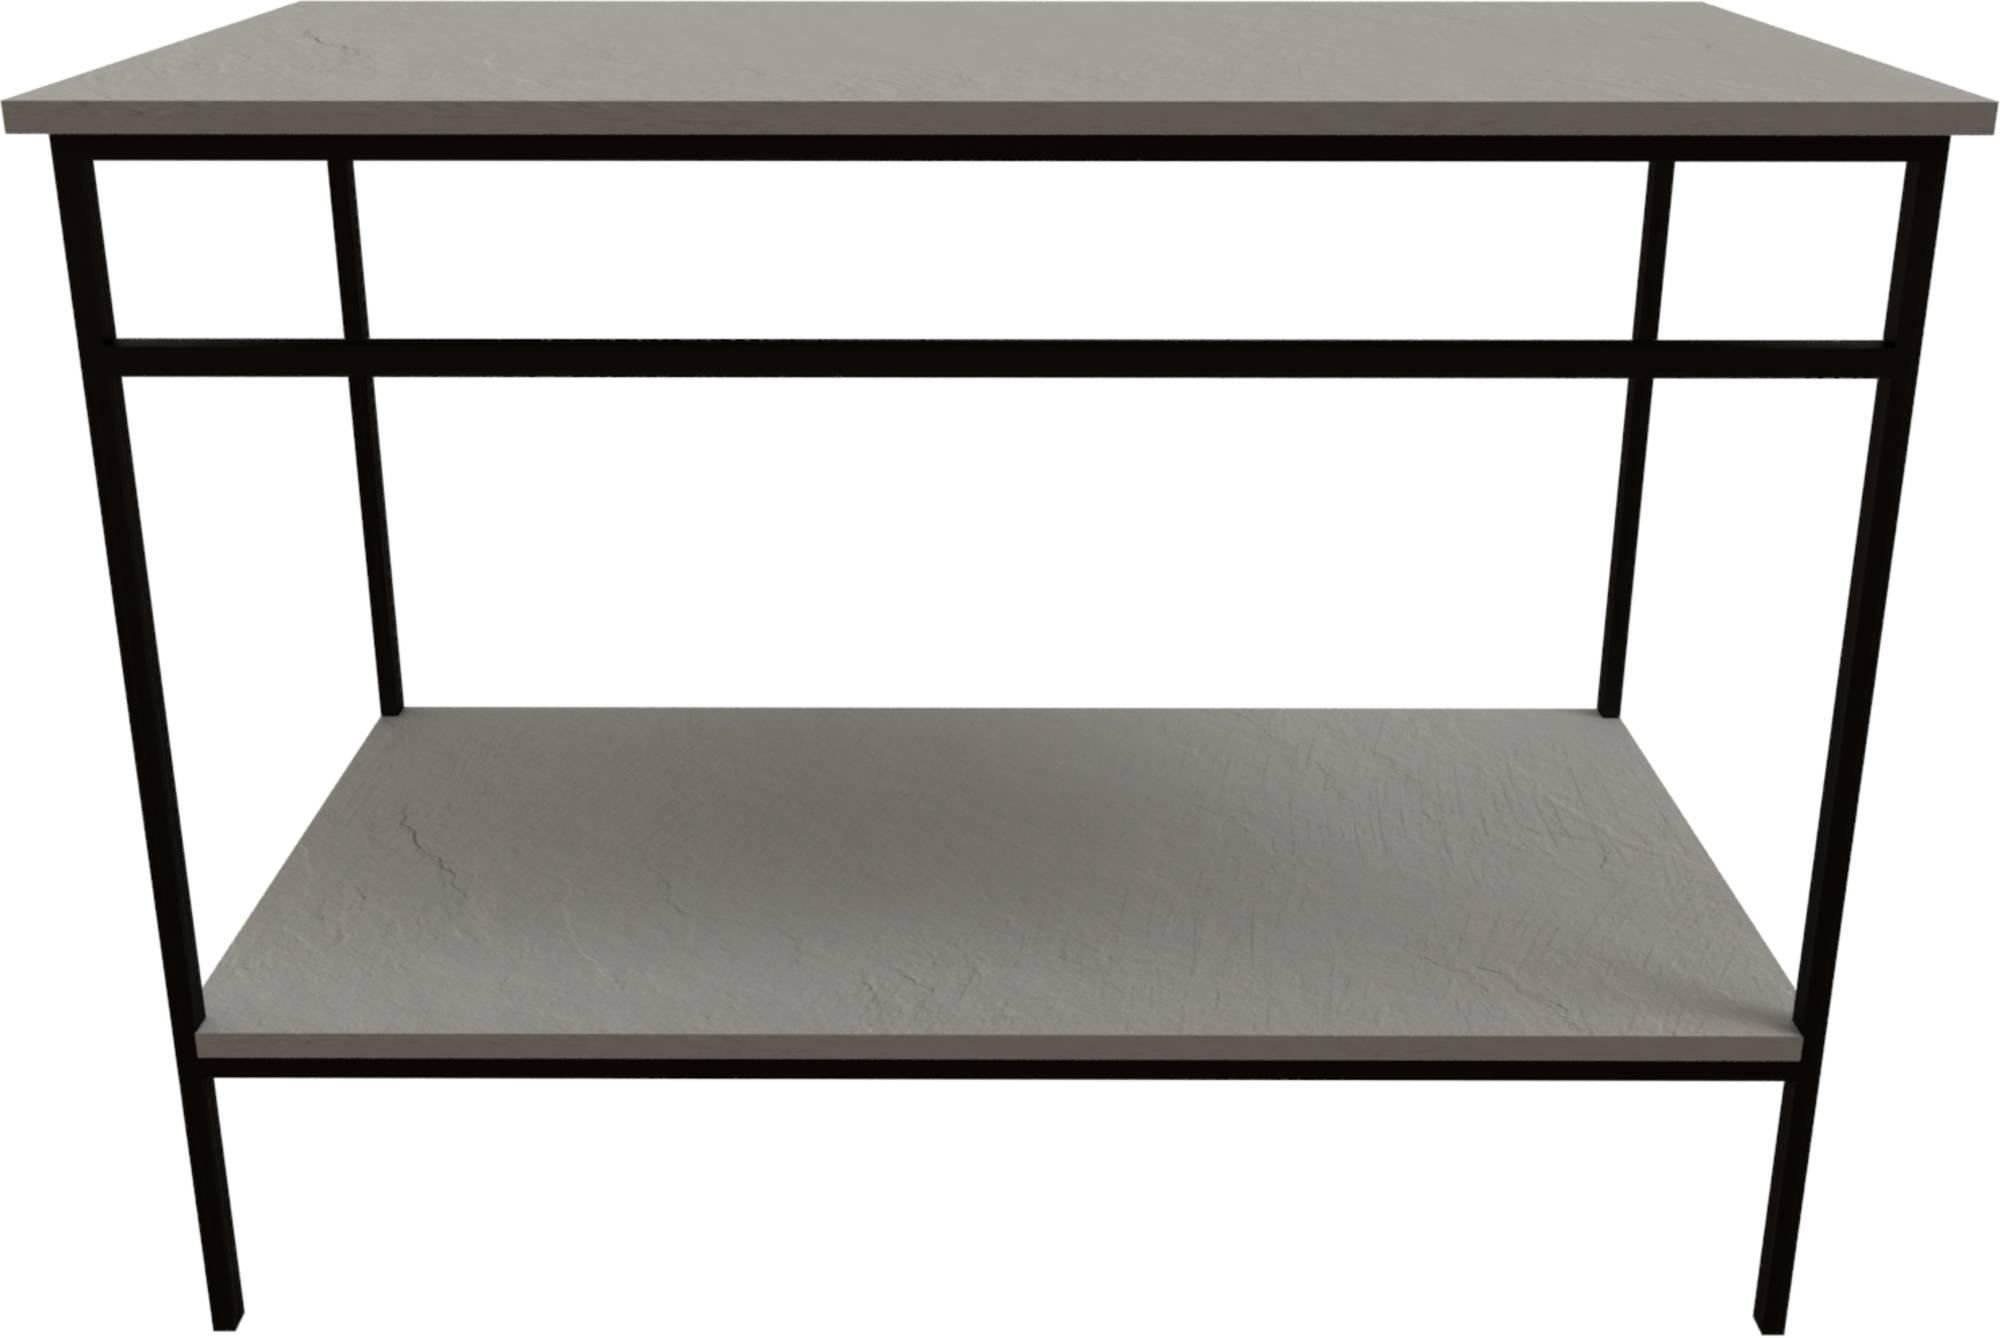 Ben Avira Set Staand Frame met Blad 80,3x46,5x85 cm Mat Zwart/Cement Grijs